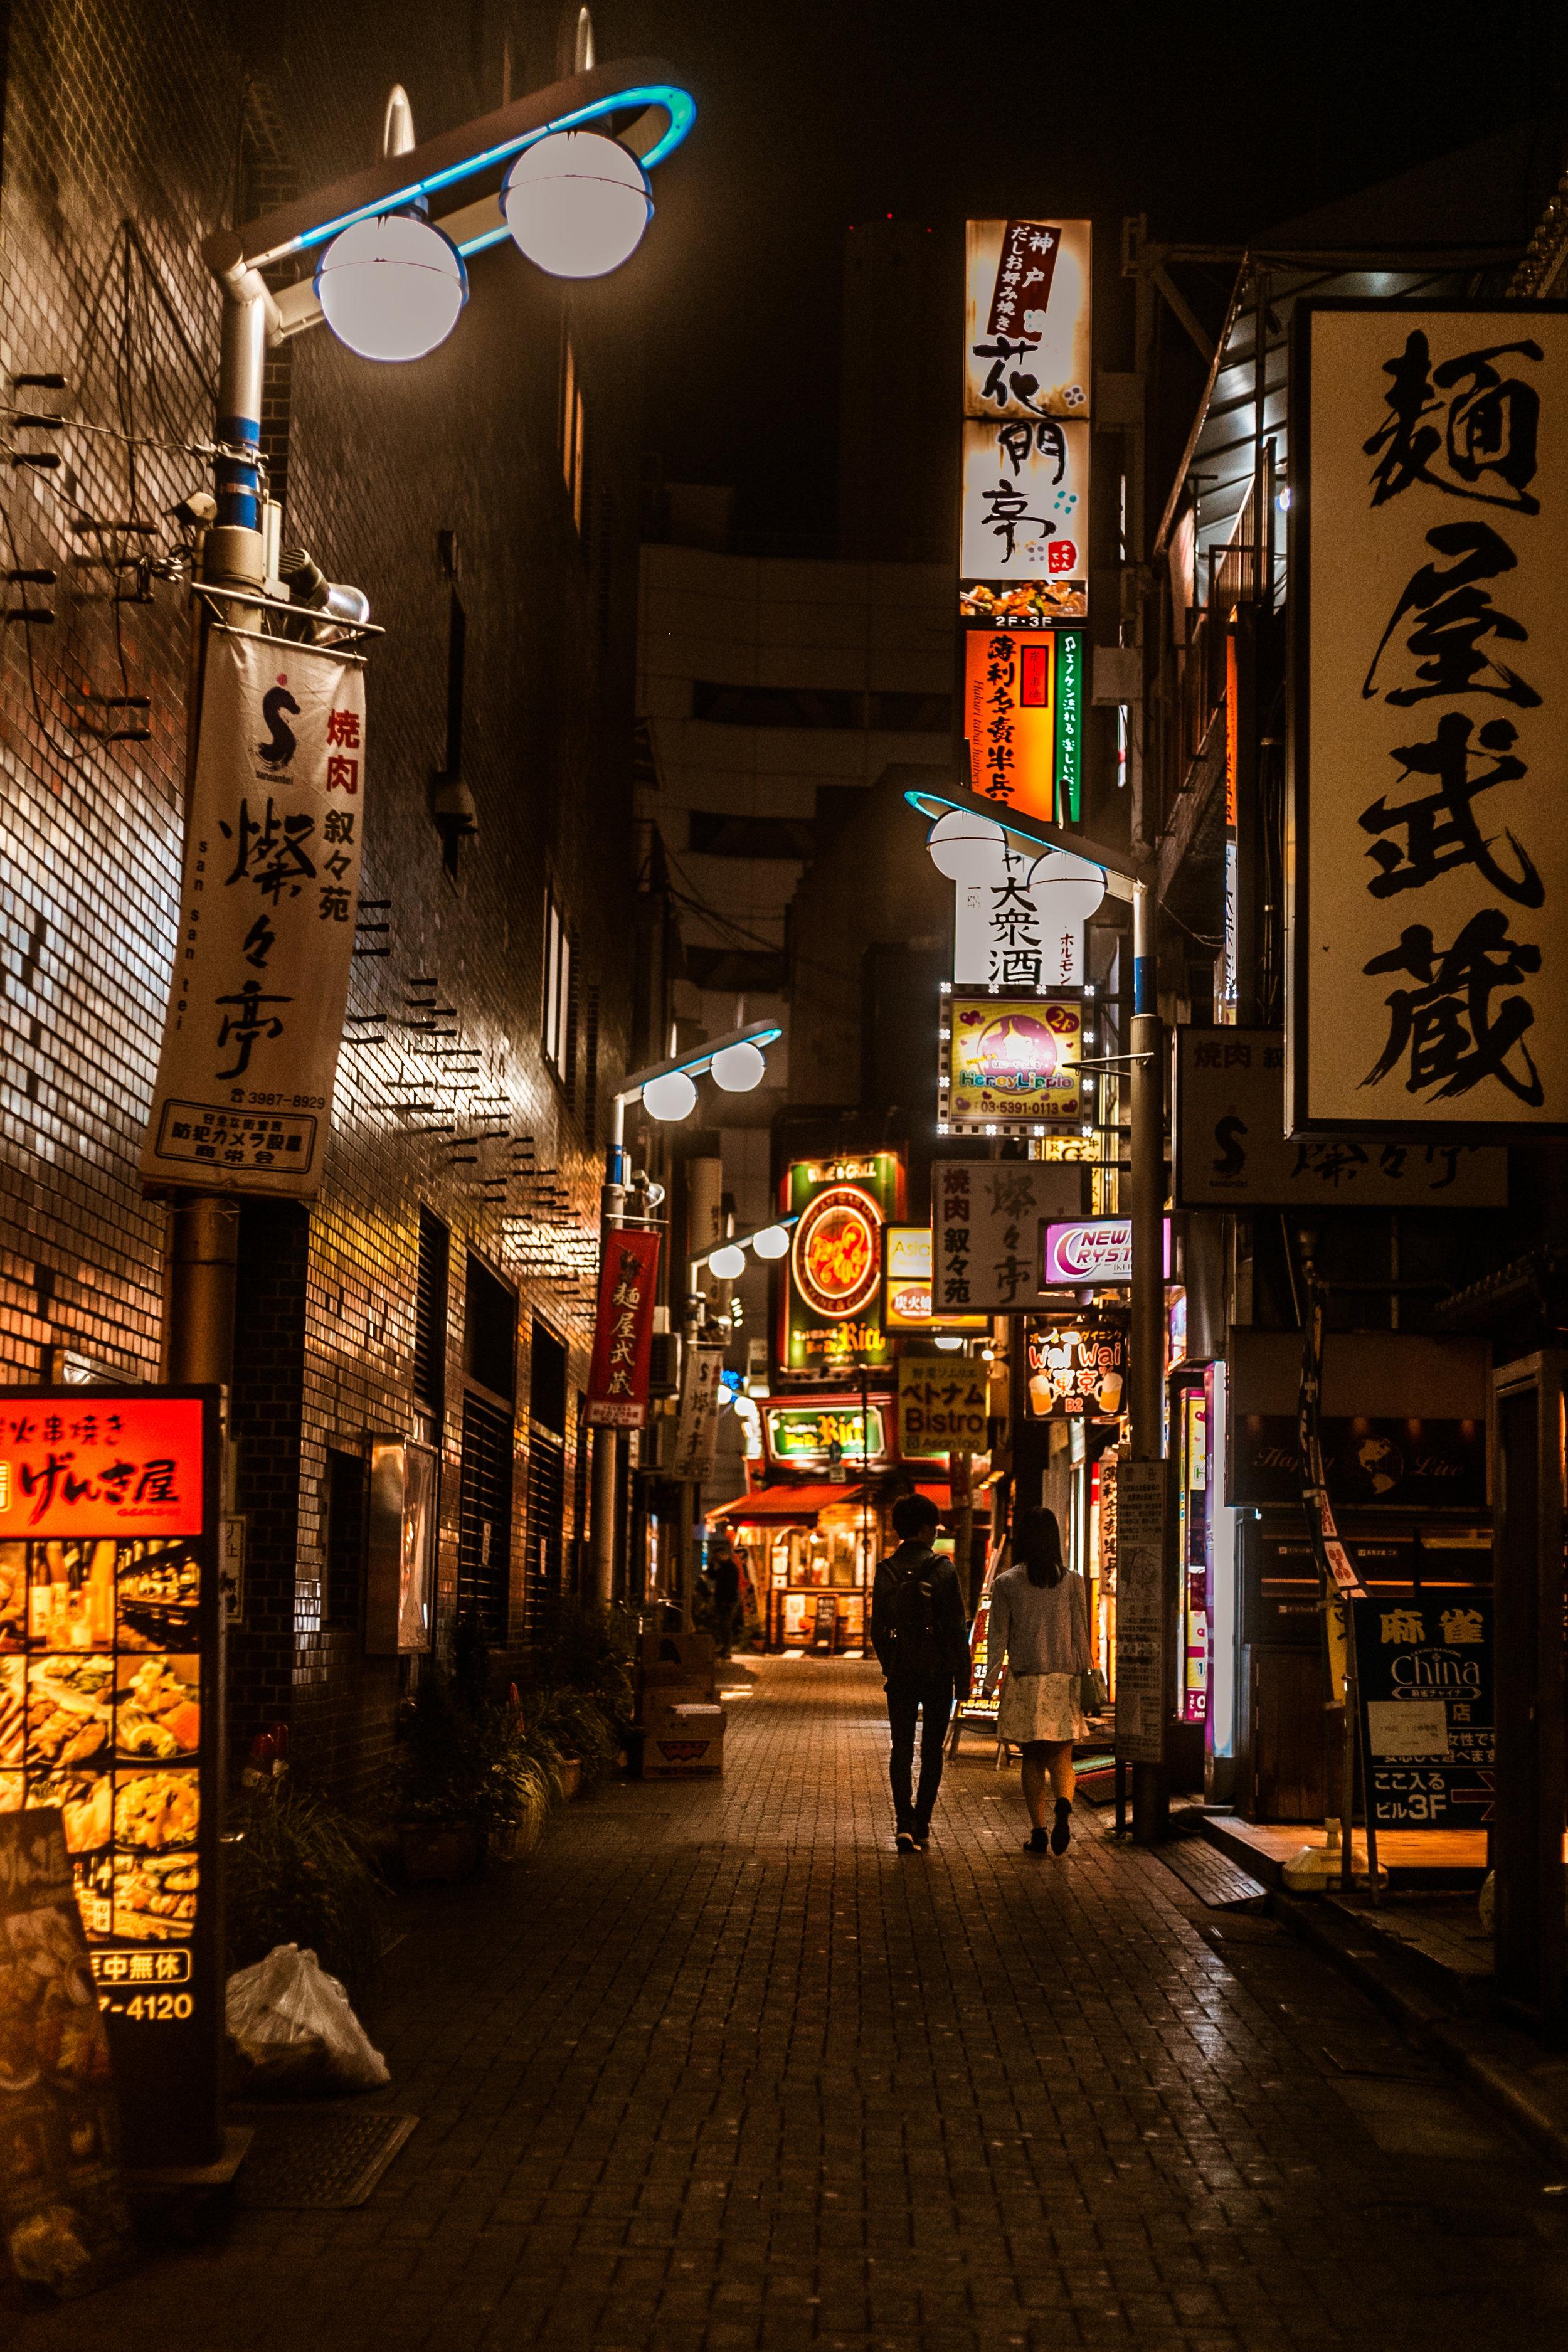 CynLagos-Japan-Teaser-Tokyo-Oct-2018 (1 of 1)-11.jpg